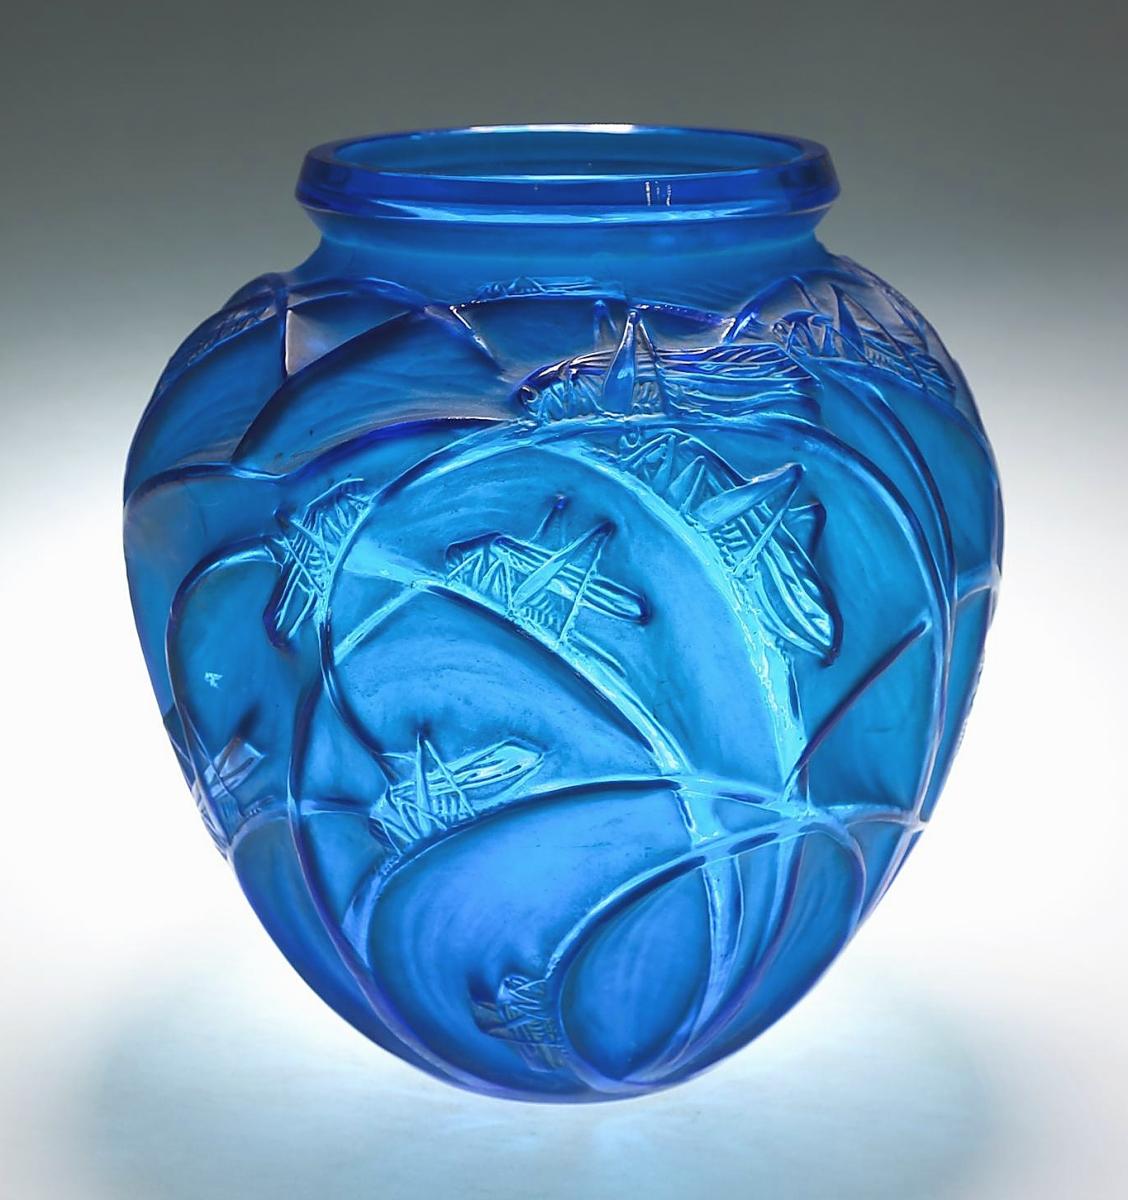 5898381 LEAD Rene Lalique, Electric Blue, White Stained Sauterelles Vase